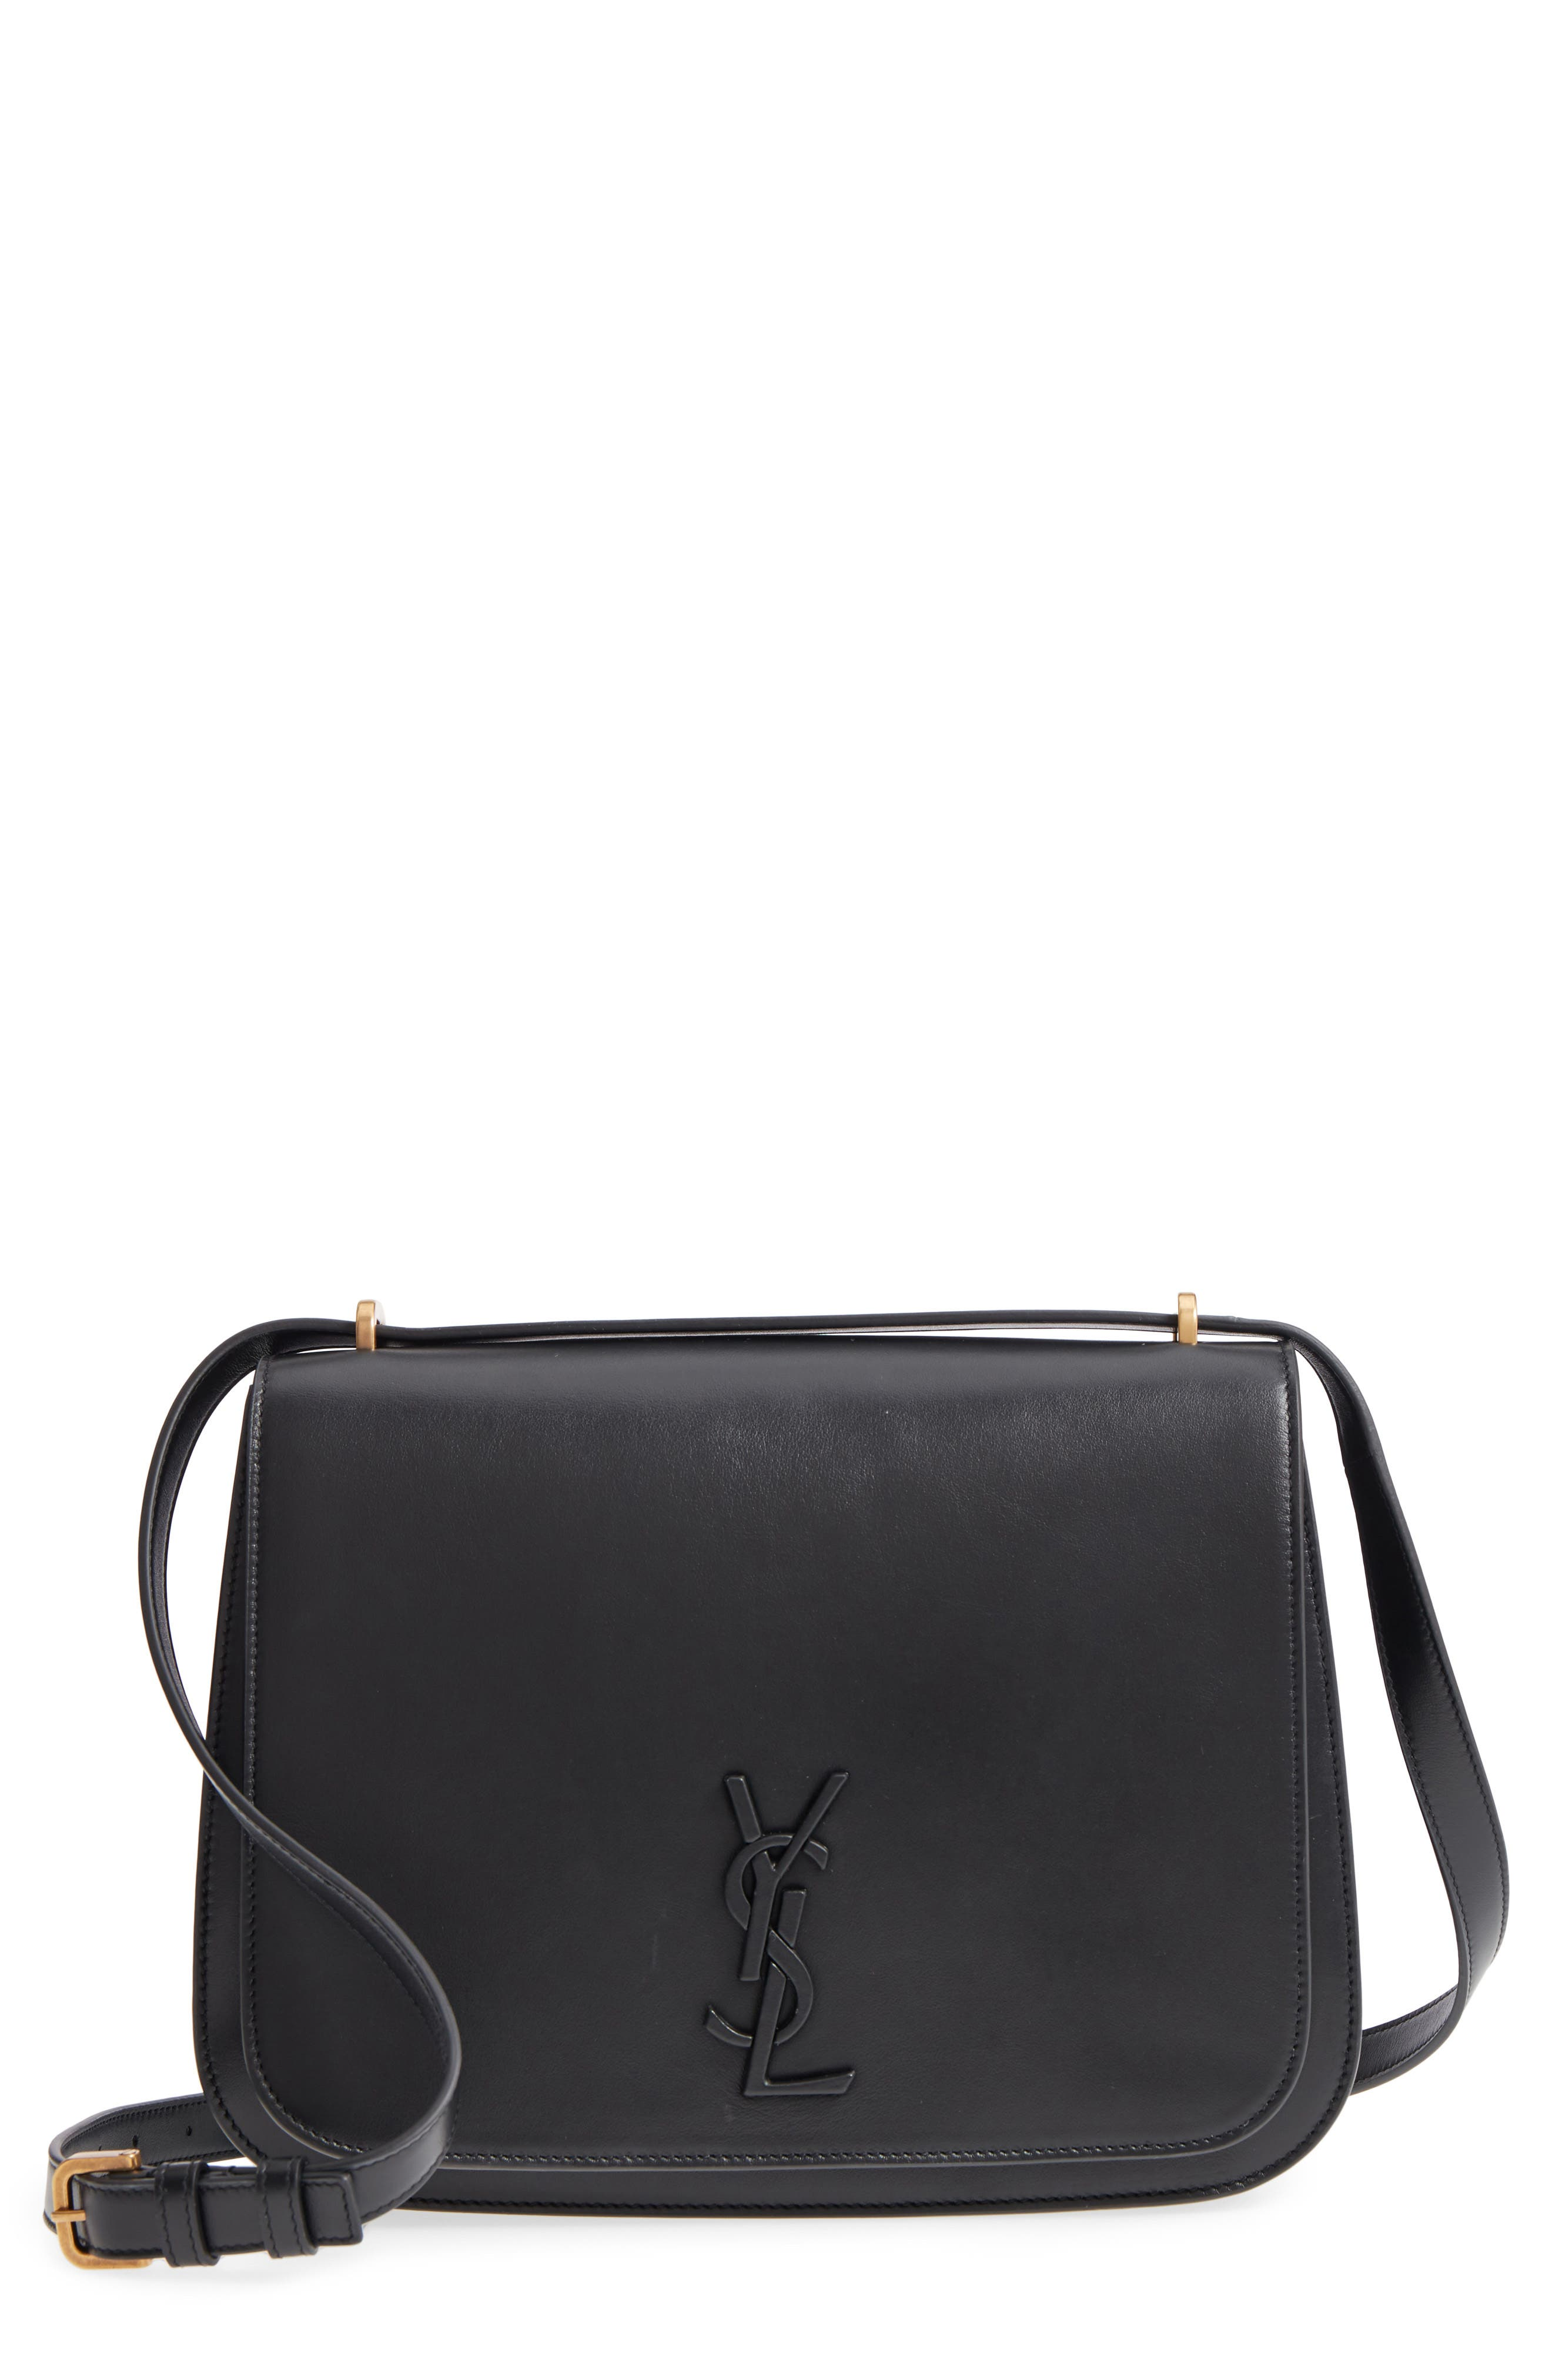 Medium Spontini Leather Shoulder Bag,                         Main,                         color, NERO